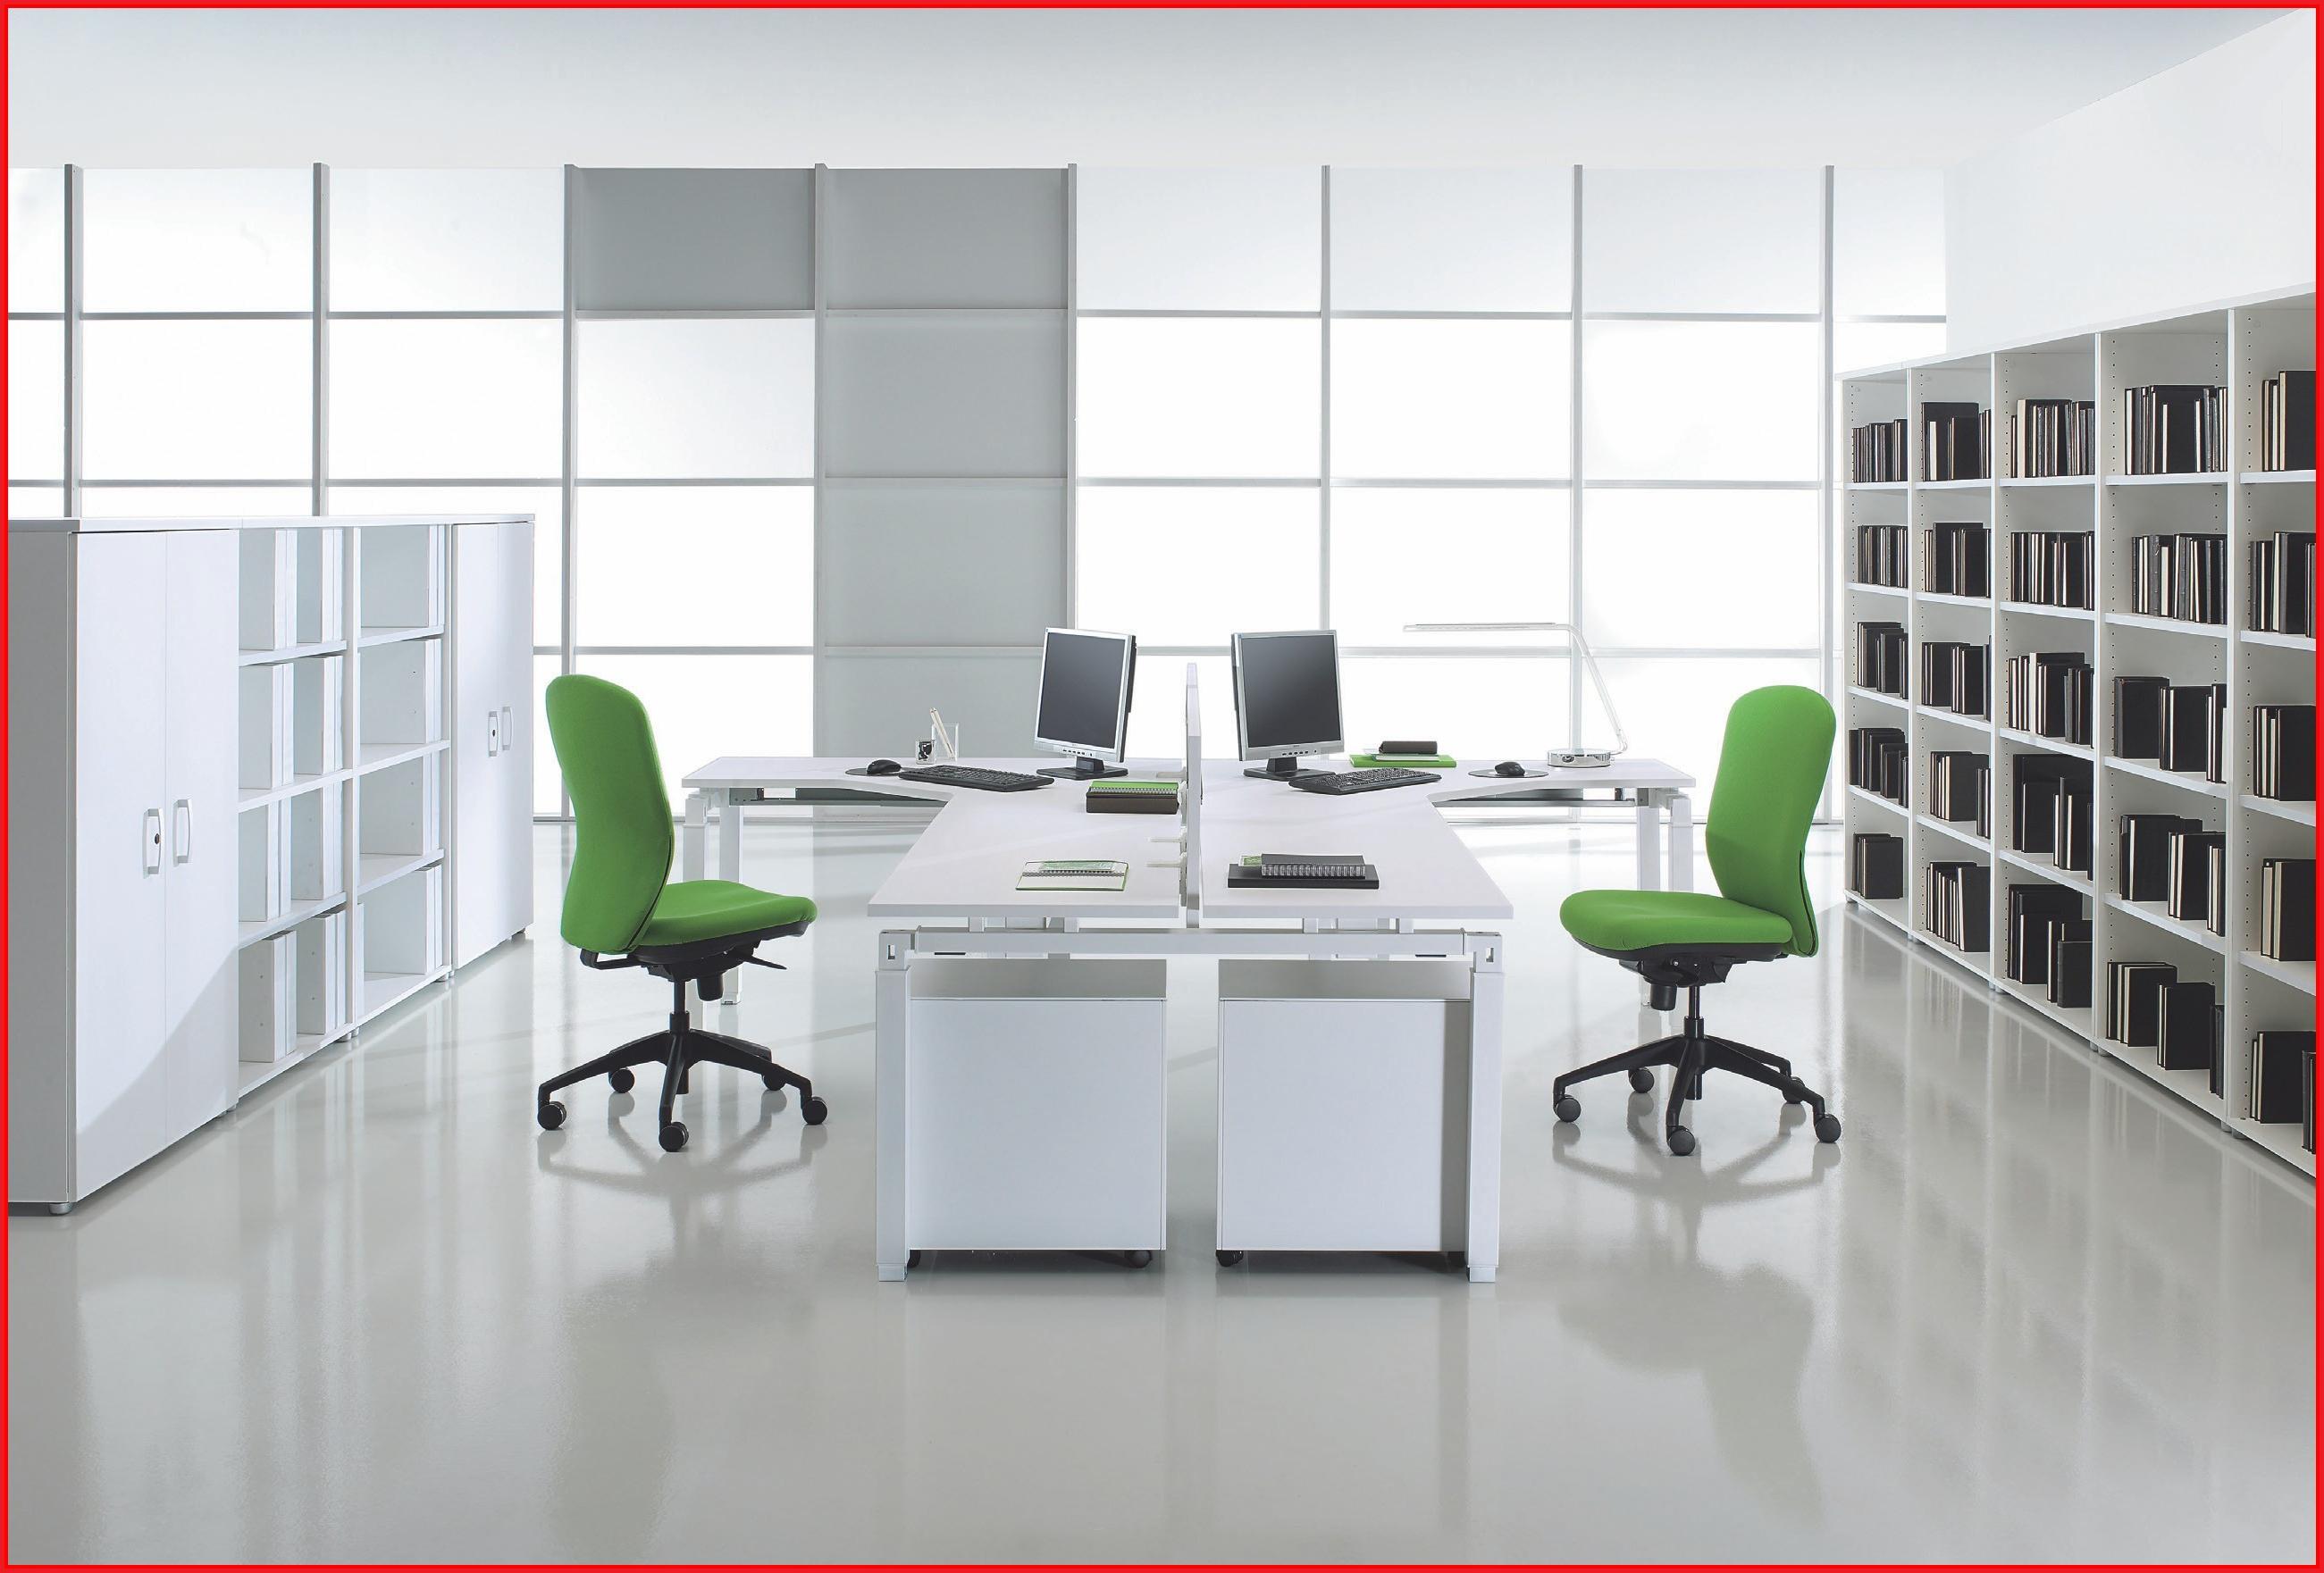 Muebles De Oficina Madrid Drdp Muebles Oficina Madrid Muebles De Icina En Madrid Muebles De